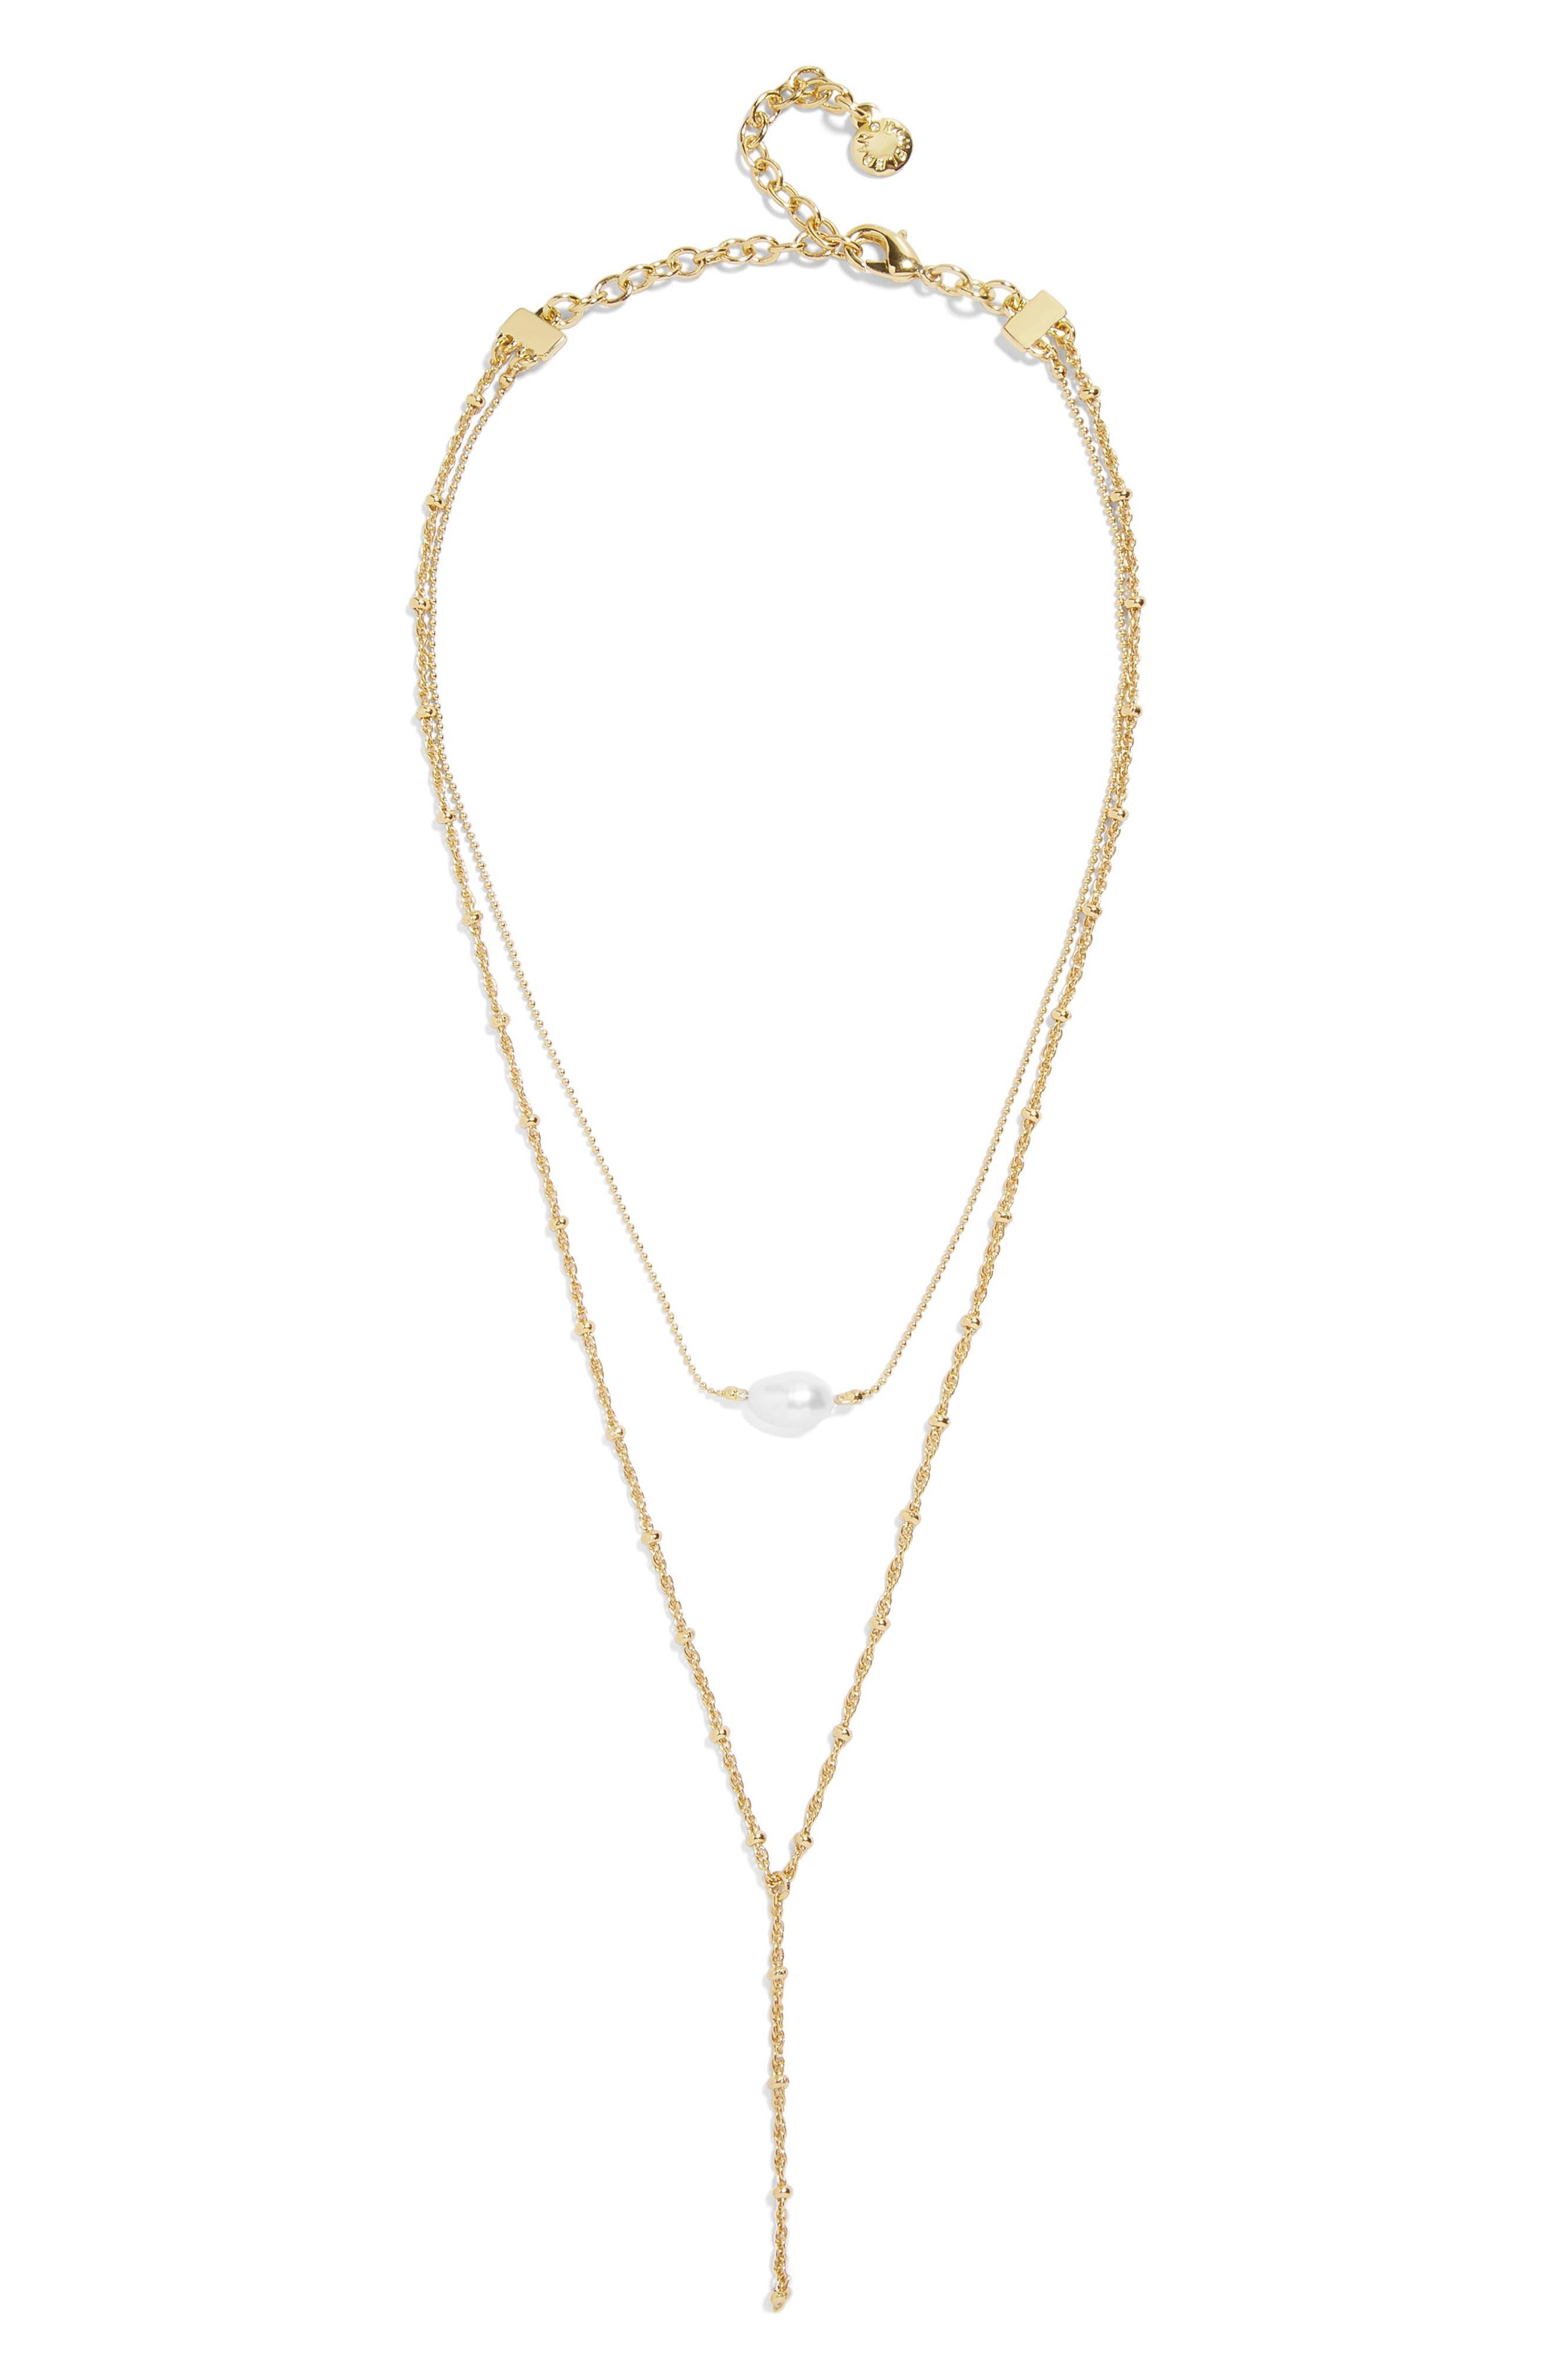 Harmonia Pearl Layered Y-Necklace,                             Main thumbnail 1, color,                             100